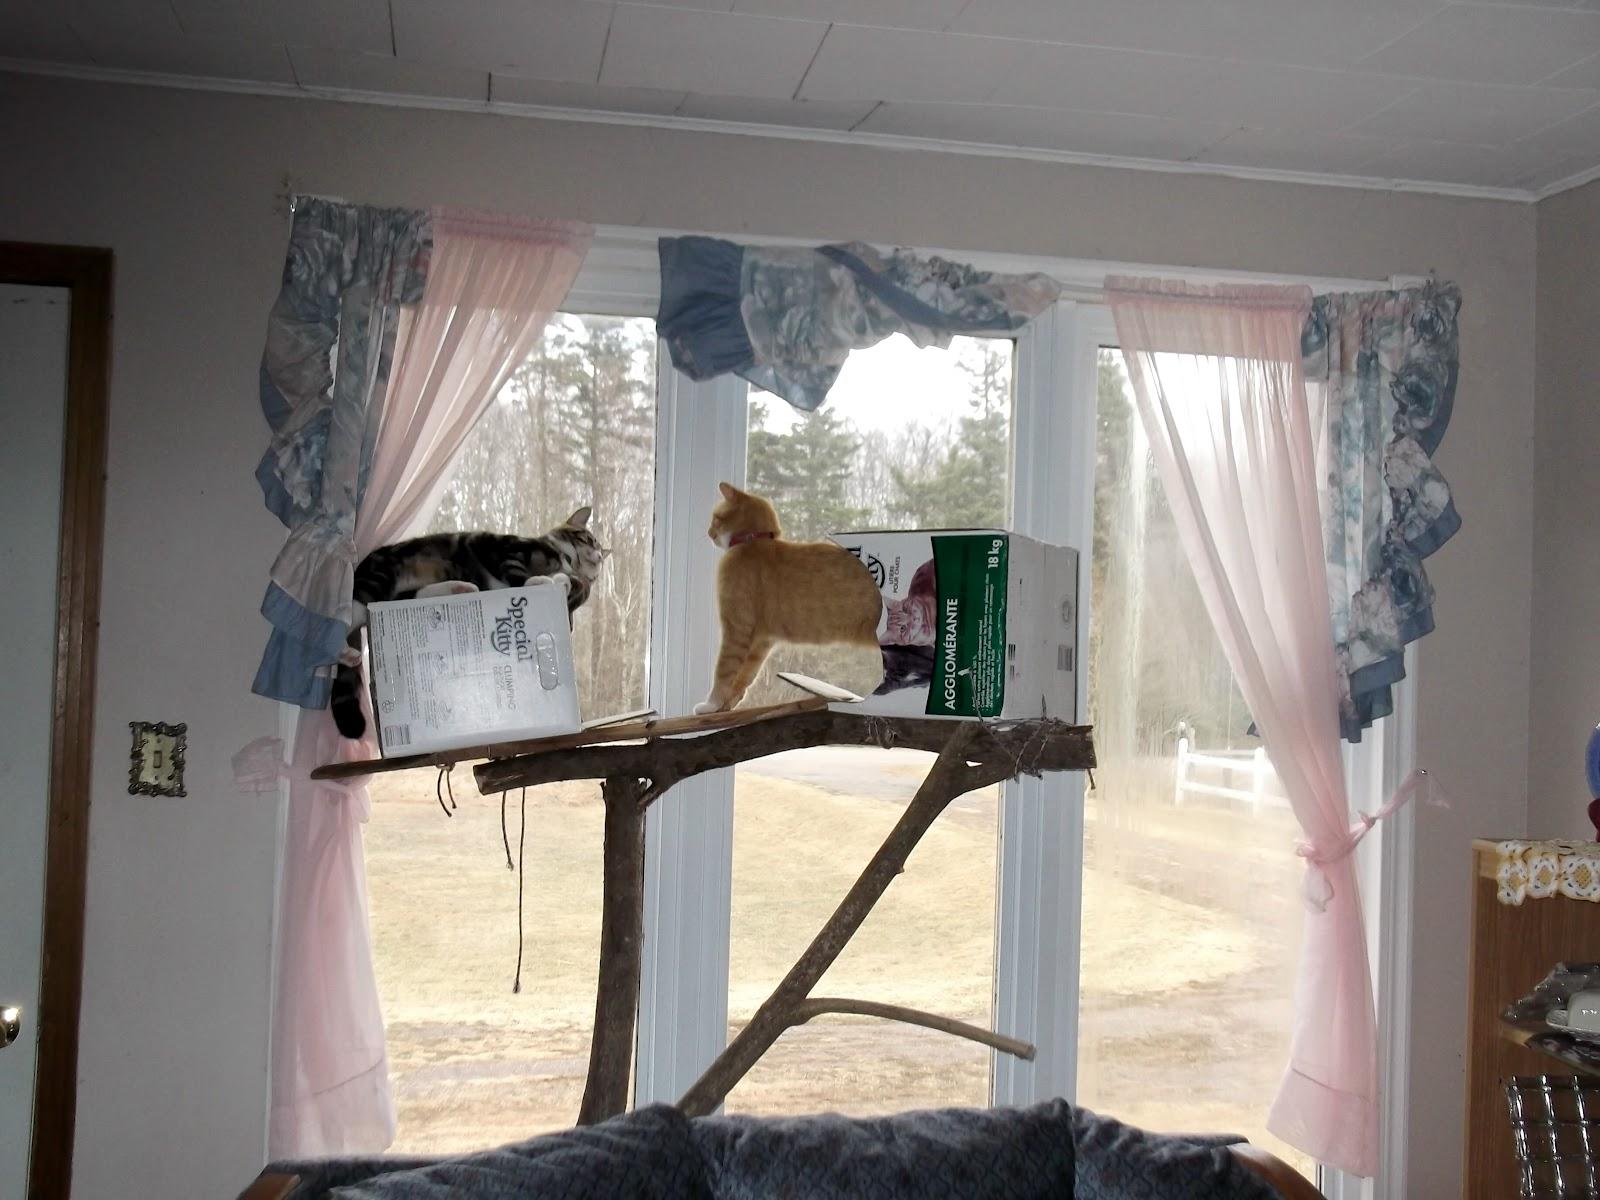 woodwork homemade cat tree plans pdf plans. Black Bedroom Furniture Sets. Home Design Ideas